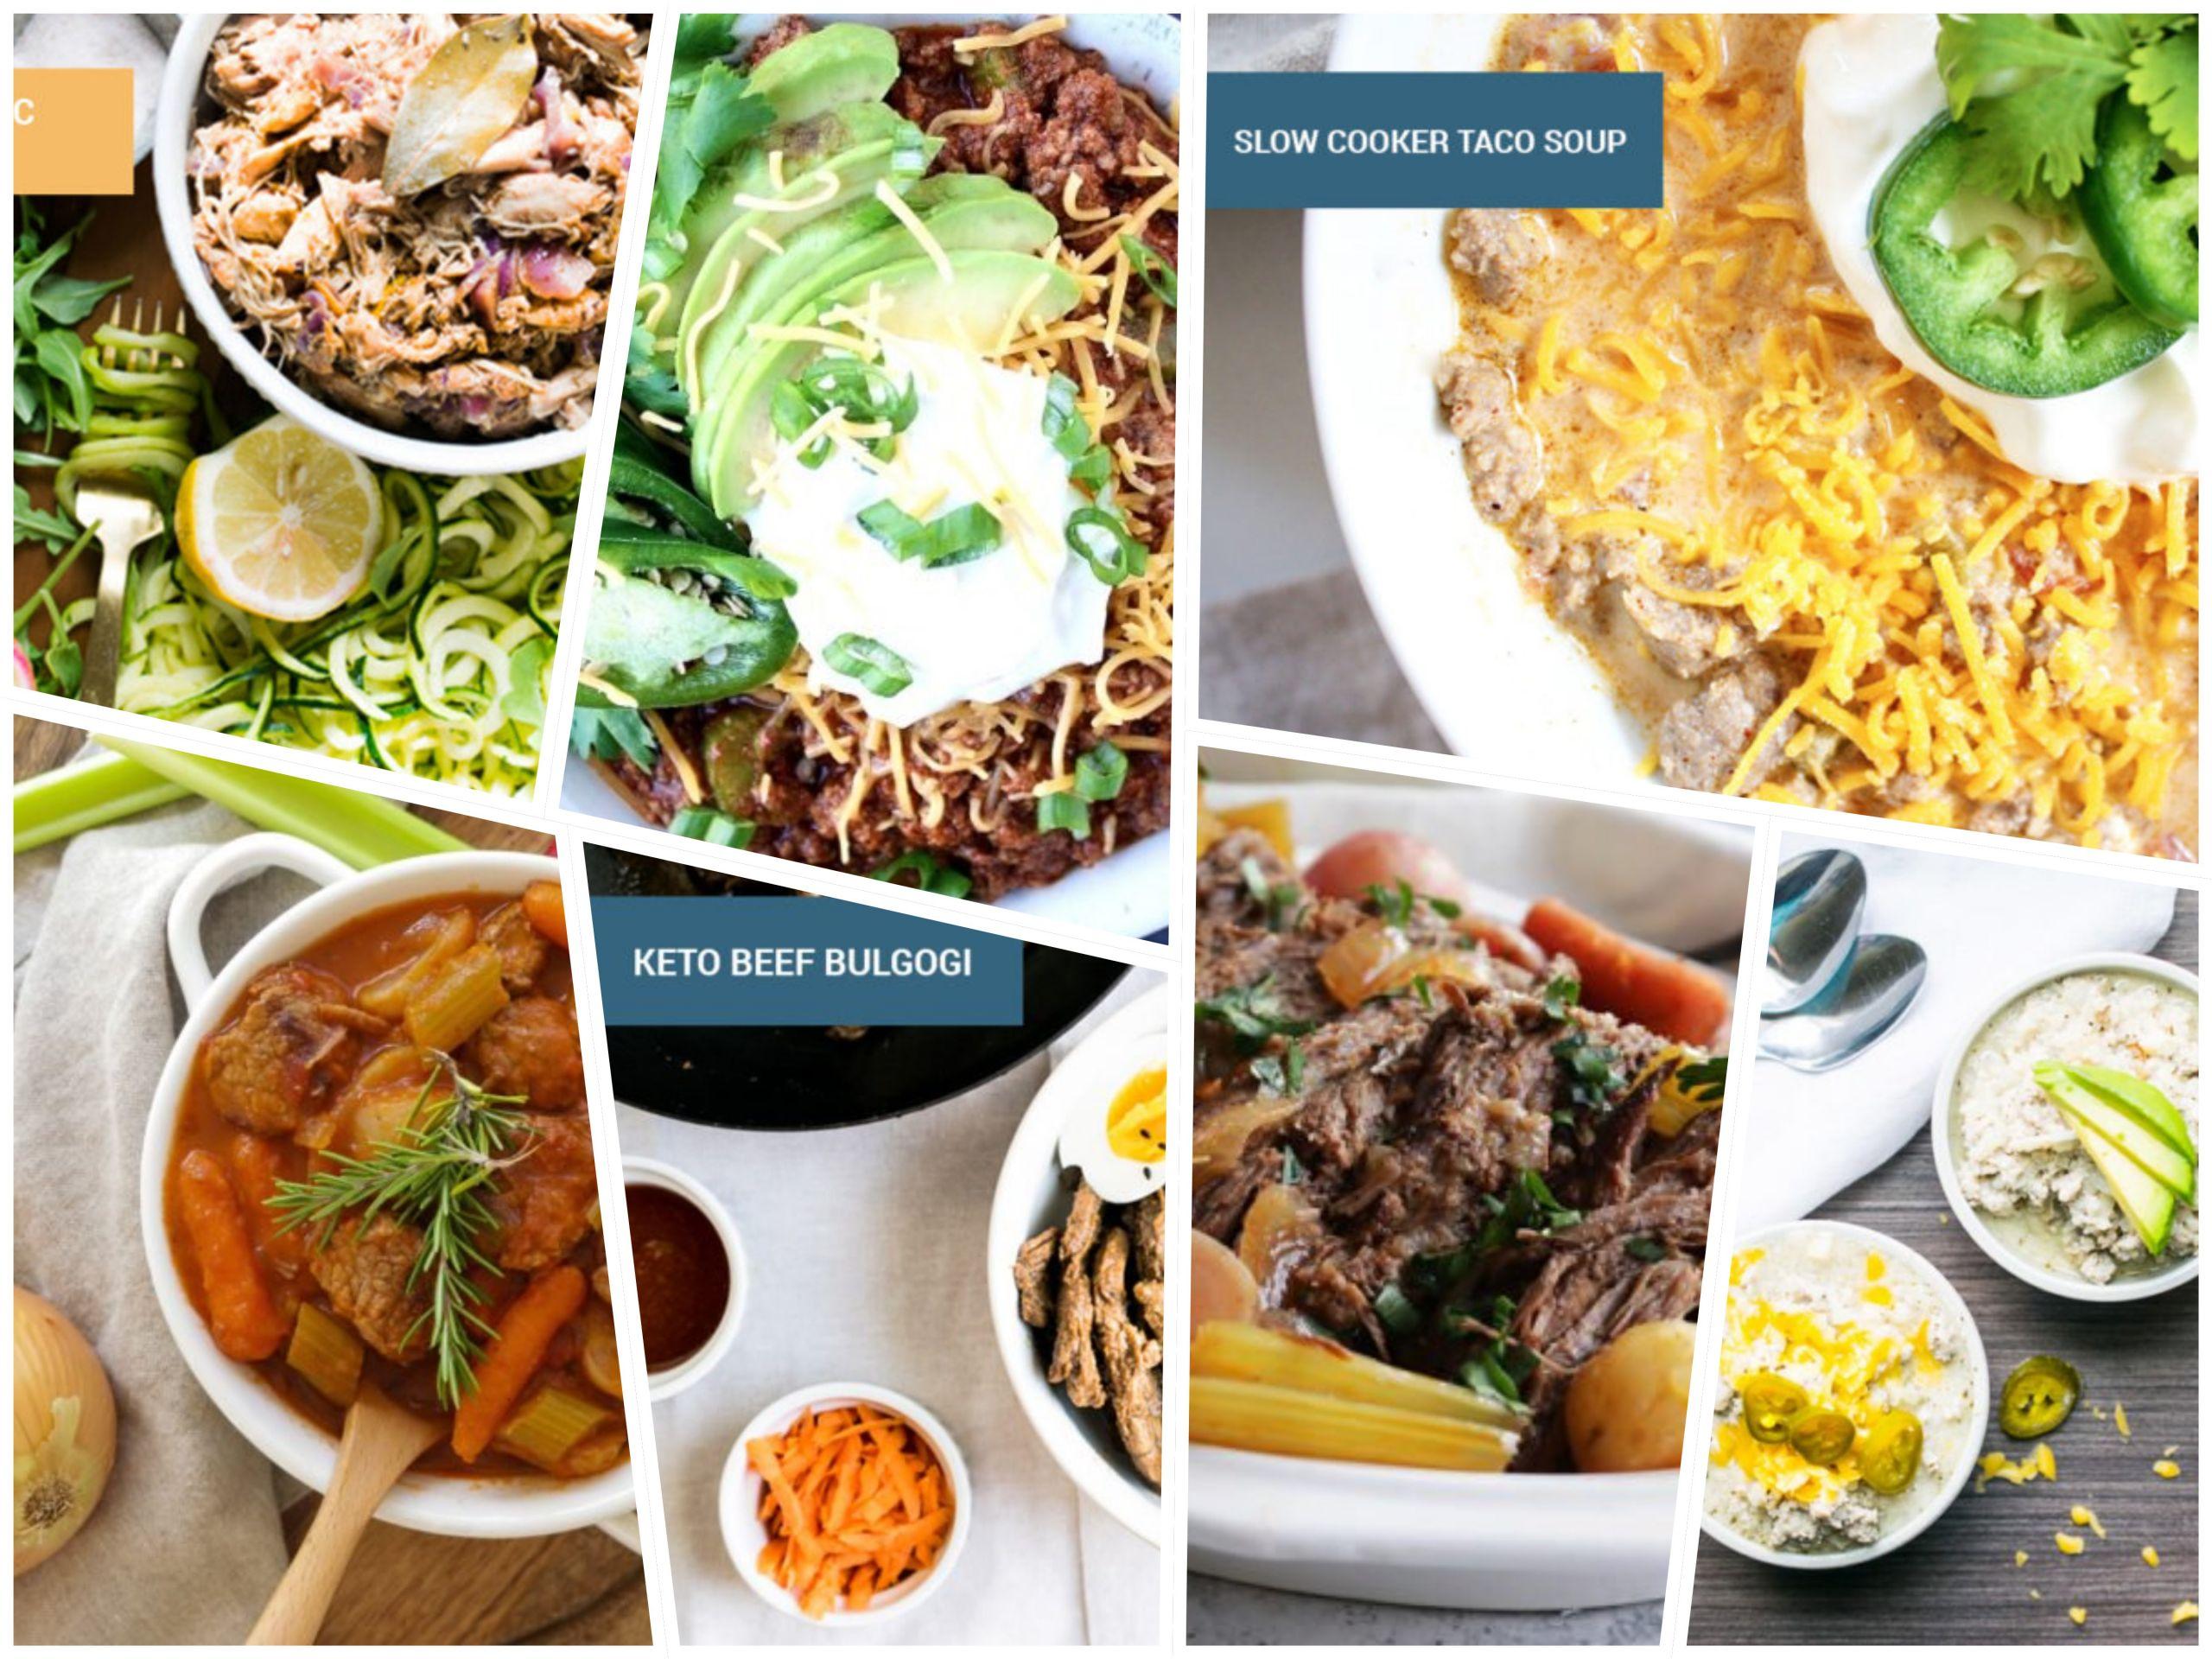 Crock Pot Keto Dinner Recipes  7 Easy Keto Crockpot Dinner Recipes Keto Beginners HQ